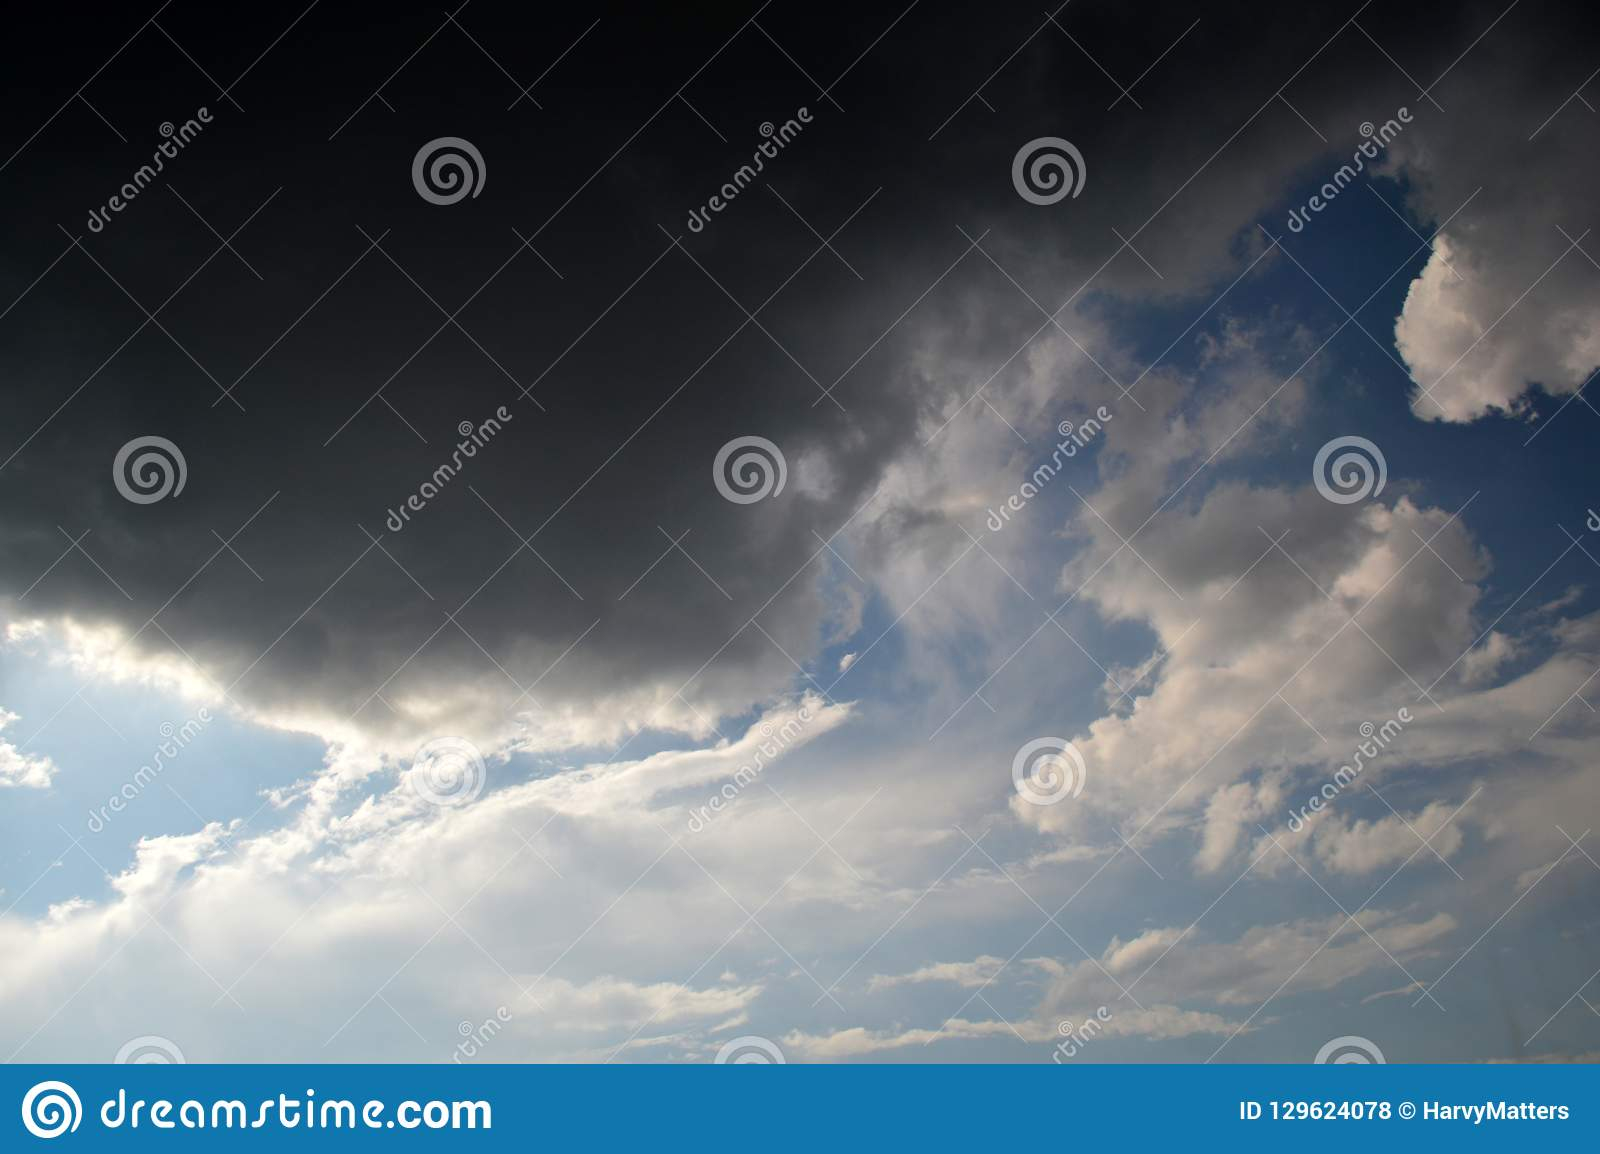 Бурные облака, оклик